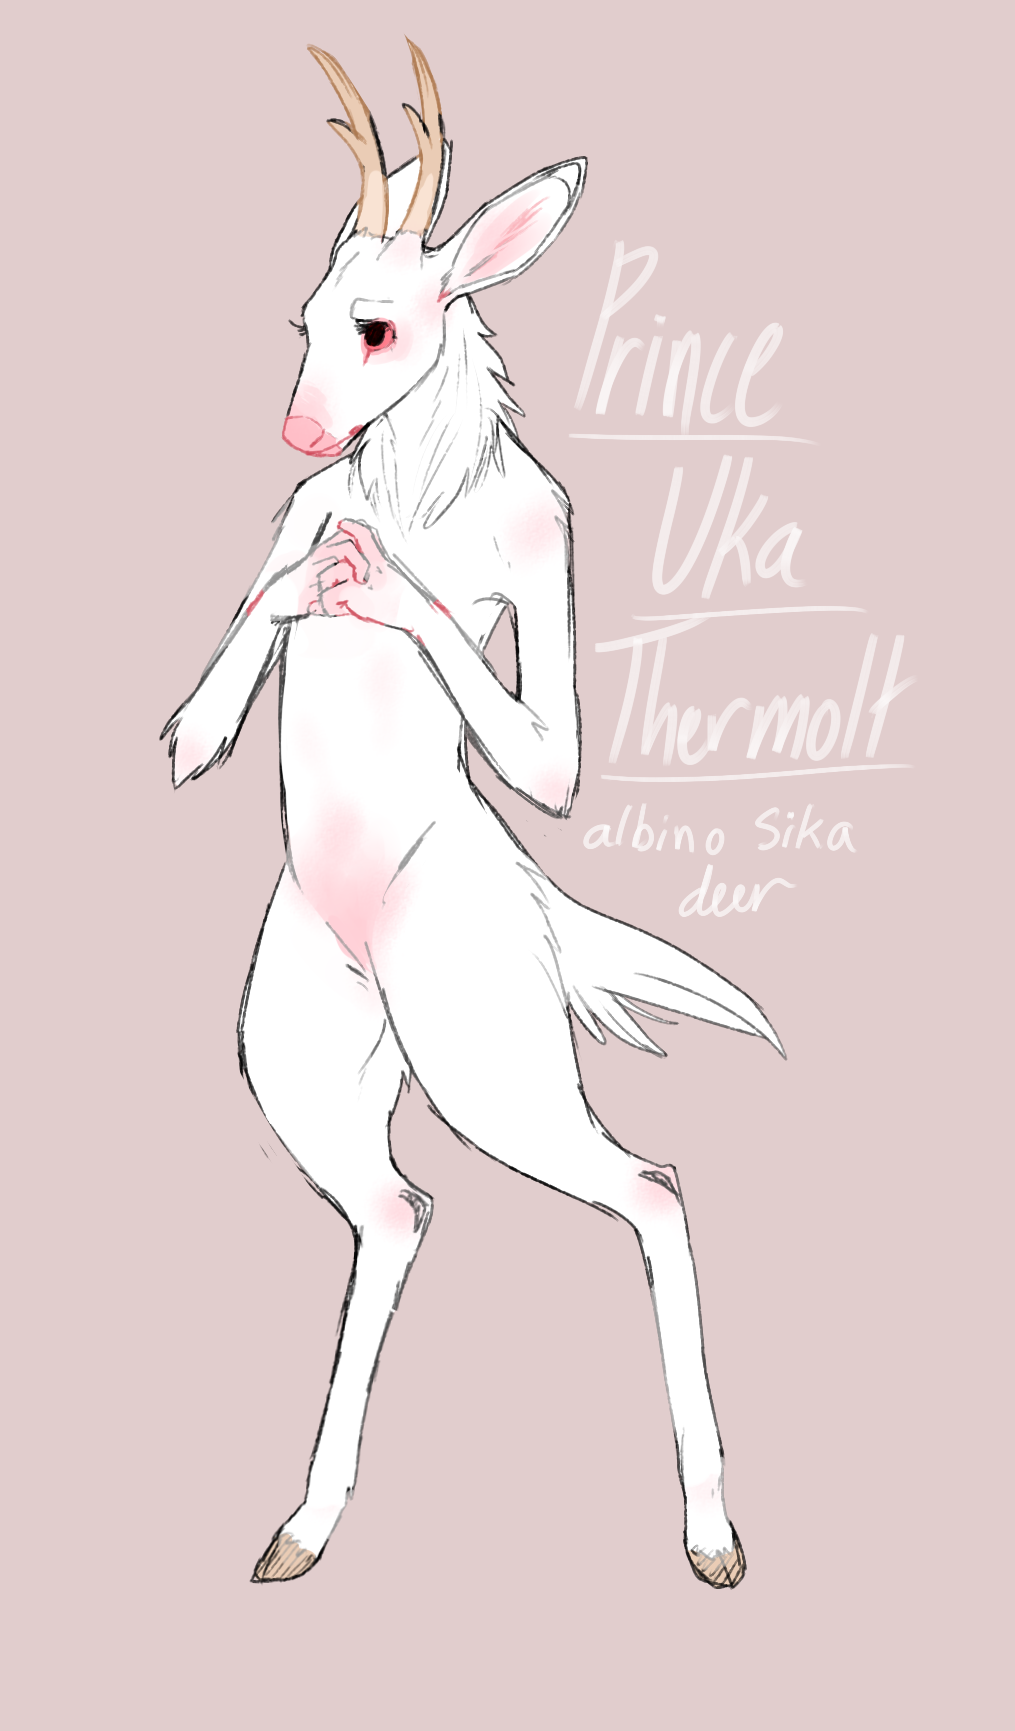 Prince Uka Thermolt